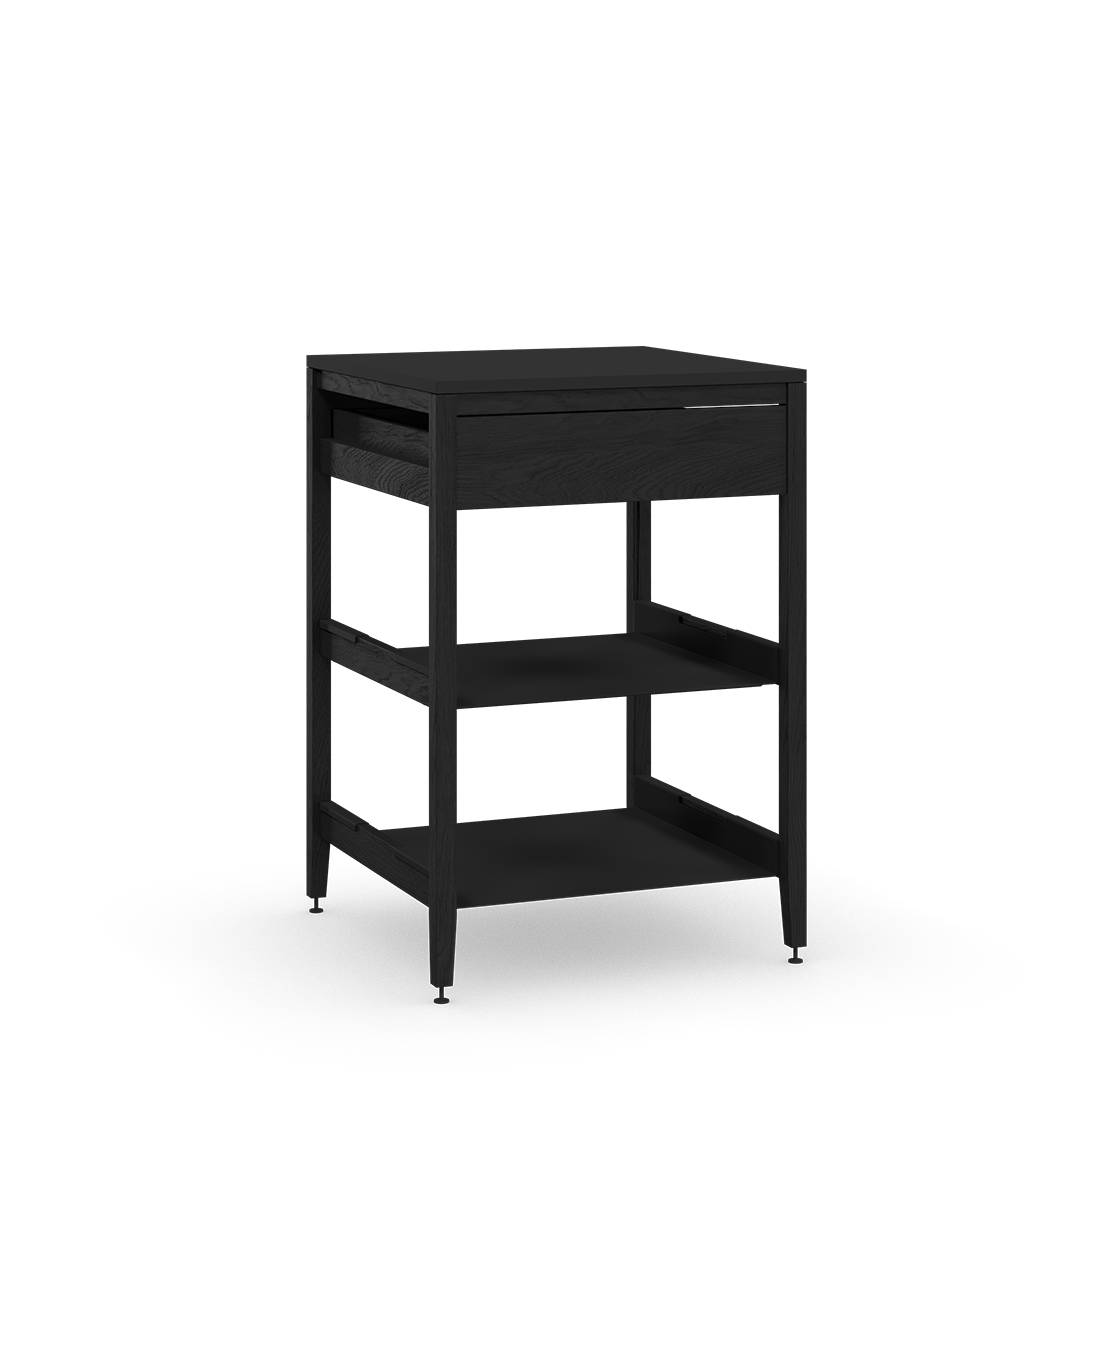 coquo radix midnight black stained oak solid wood modular 2 shelves 1 drawer base kitchen cabinet 27 inch C1-C-27SB-1022-BK